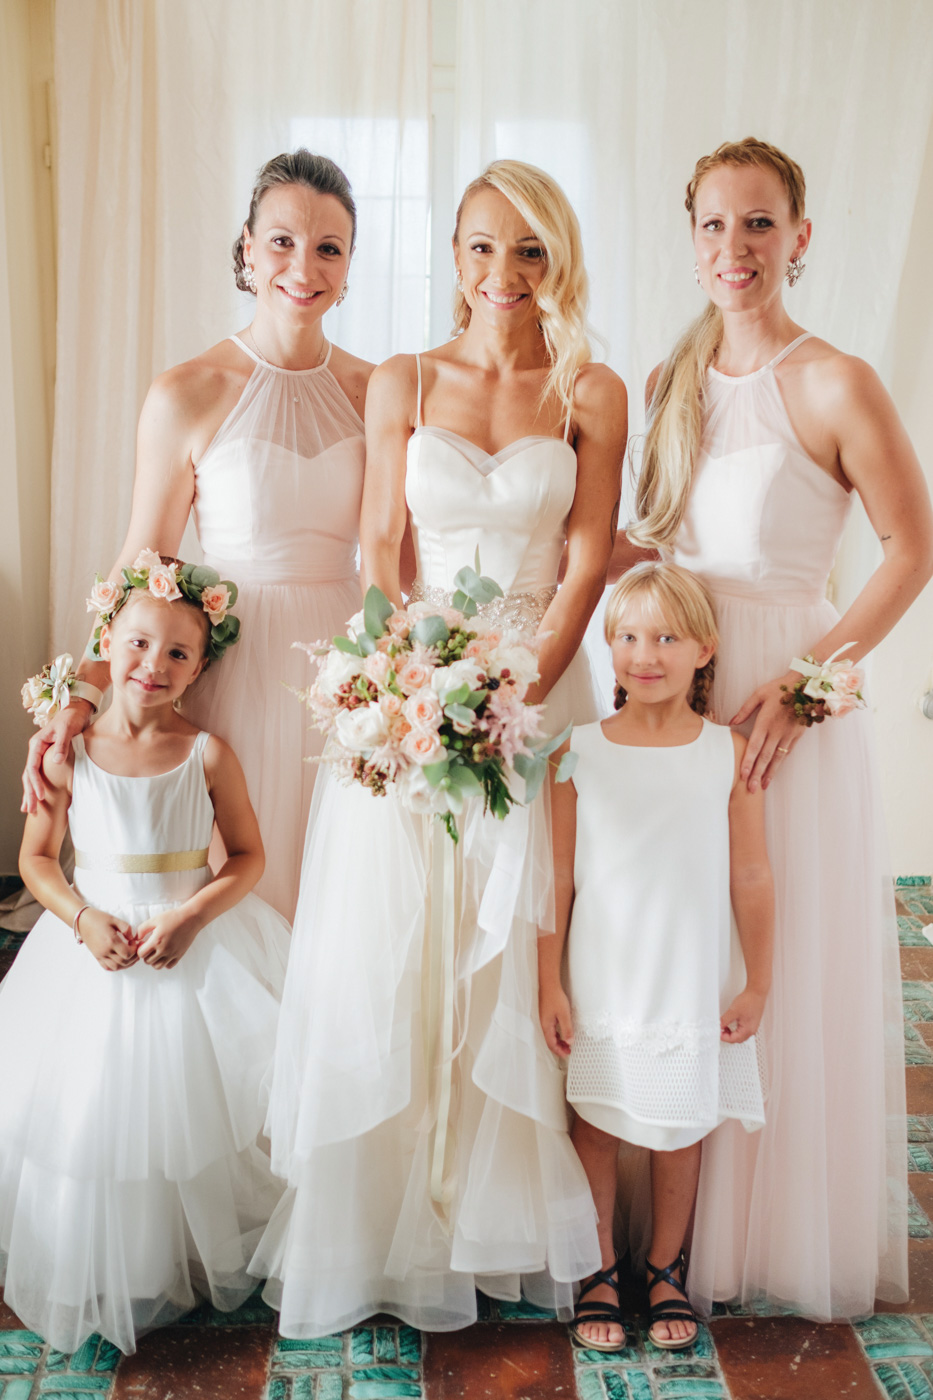 Matrimoni all'italiana wedding photographer italy-42.jpg